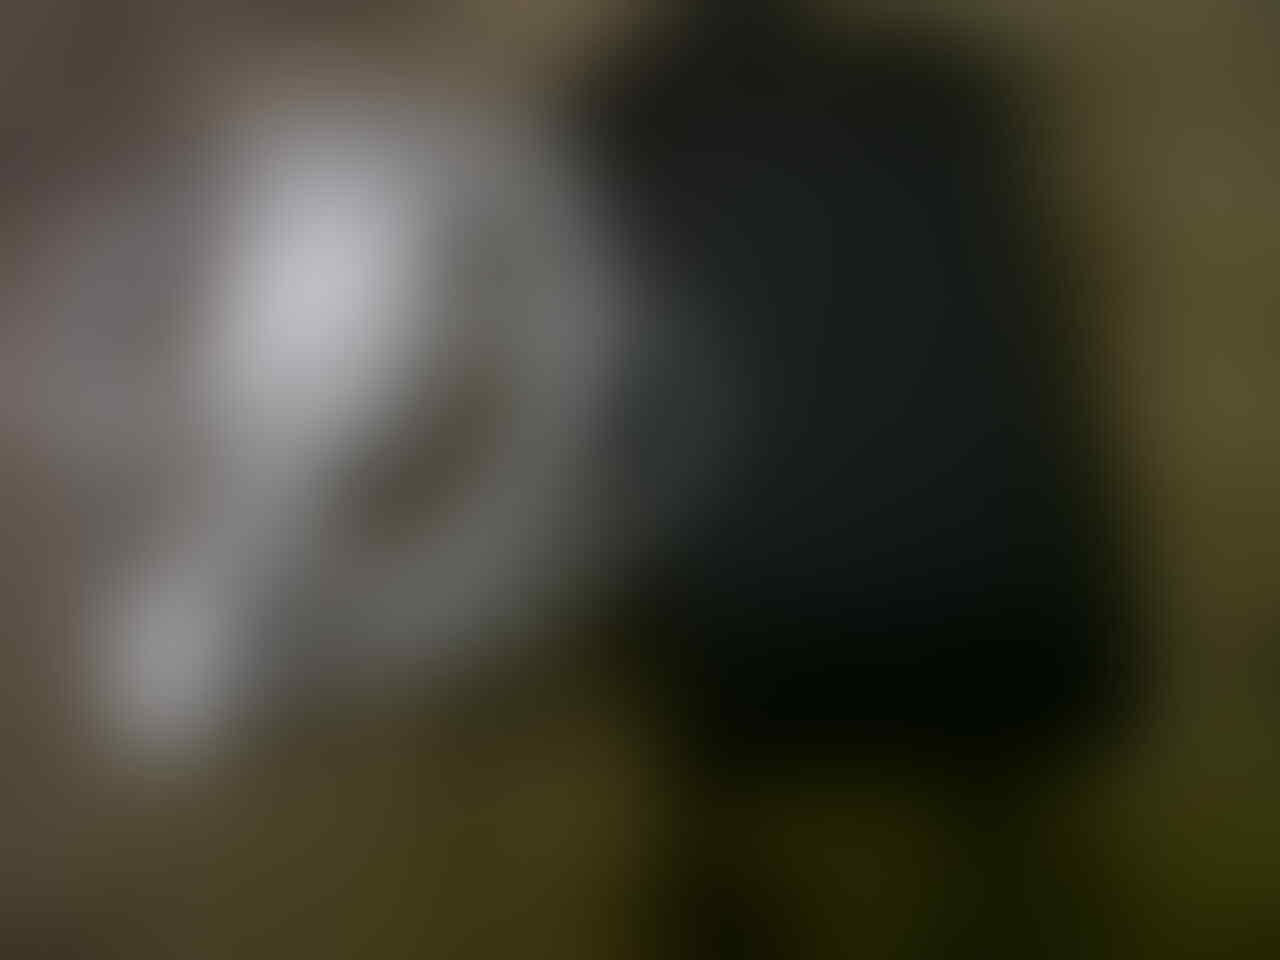 jual ipod touch 4th 32gb dan samsung champ 3303i